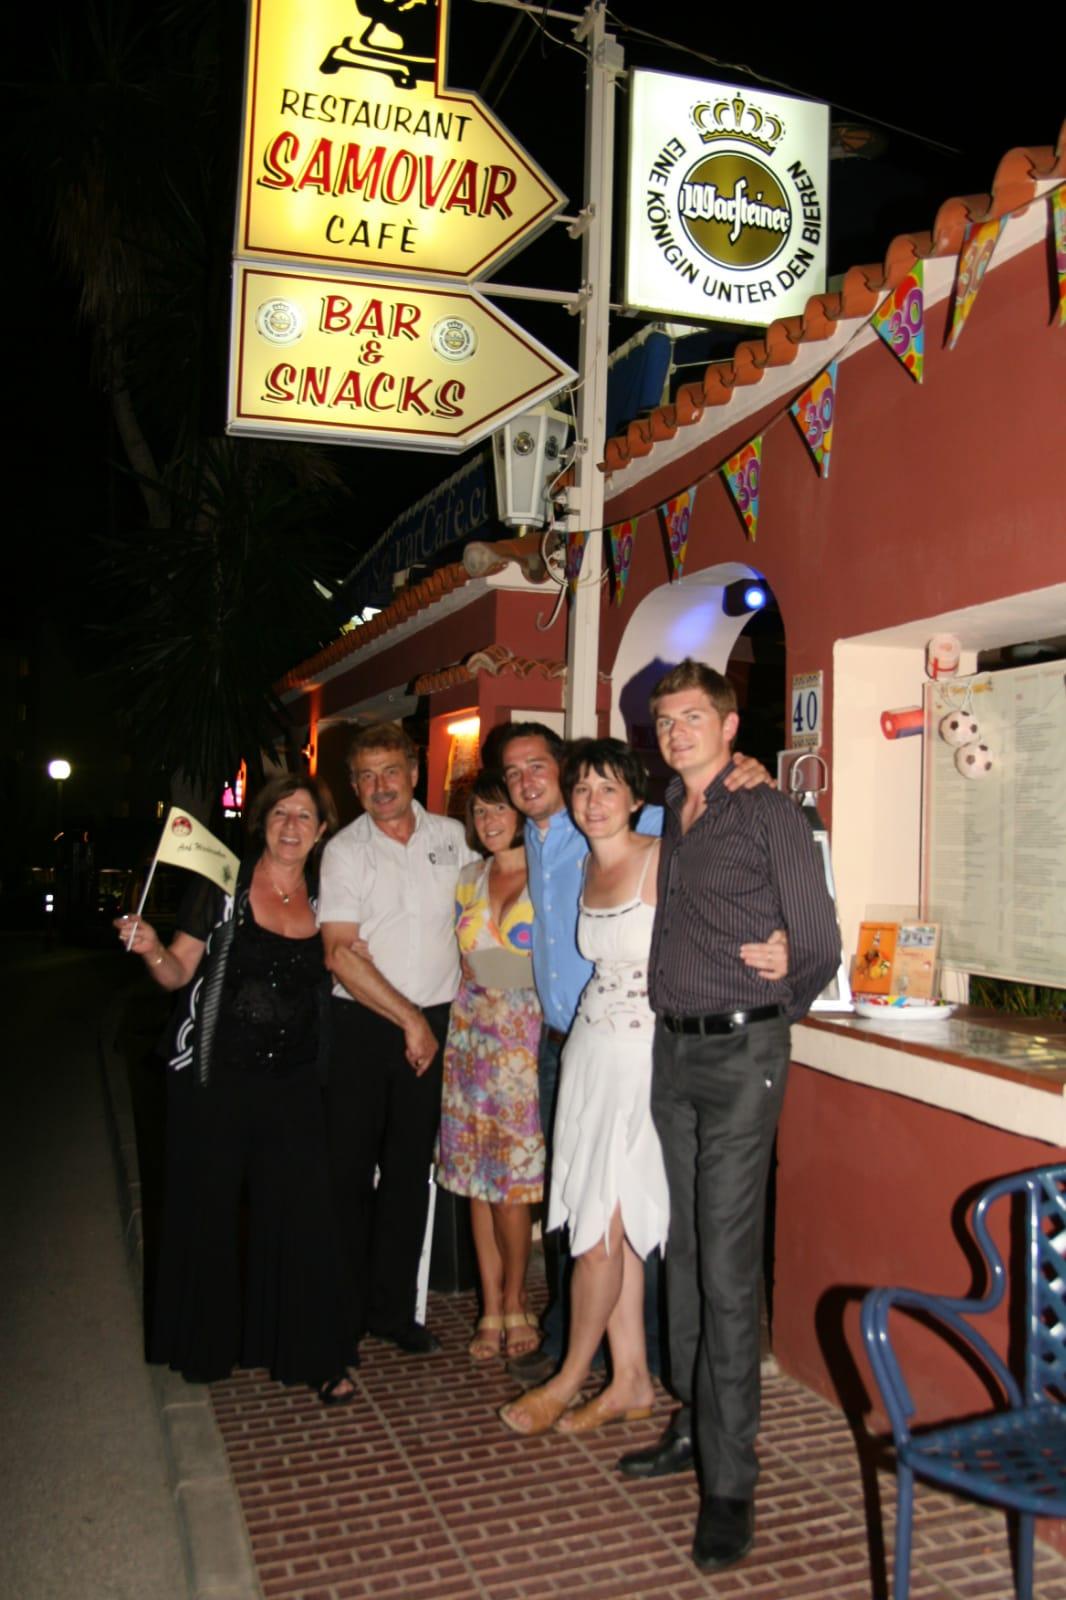 Samos Group Ibiza Family - Siesta Samovar